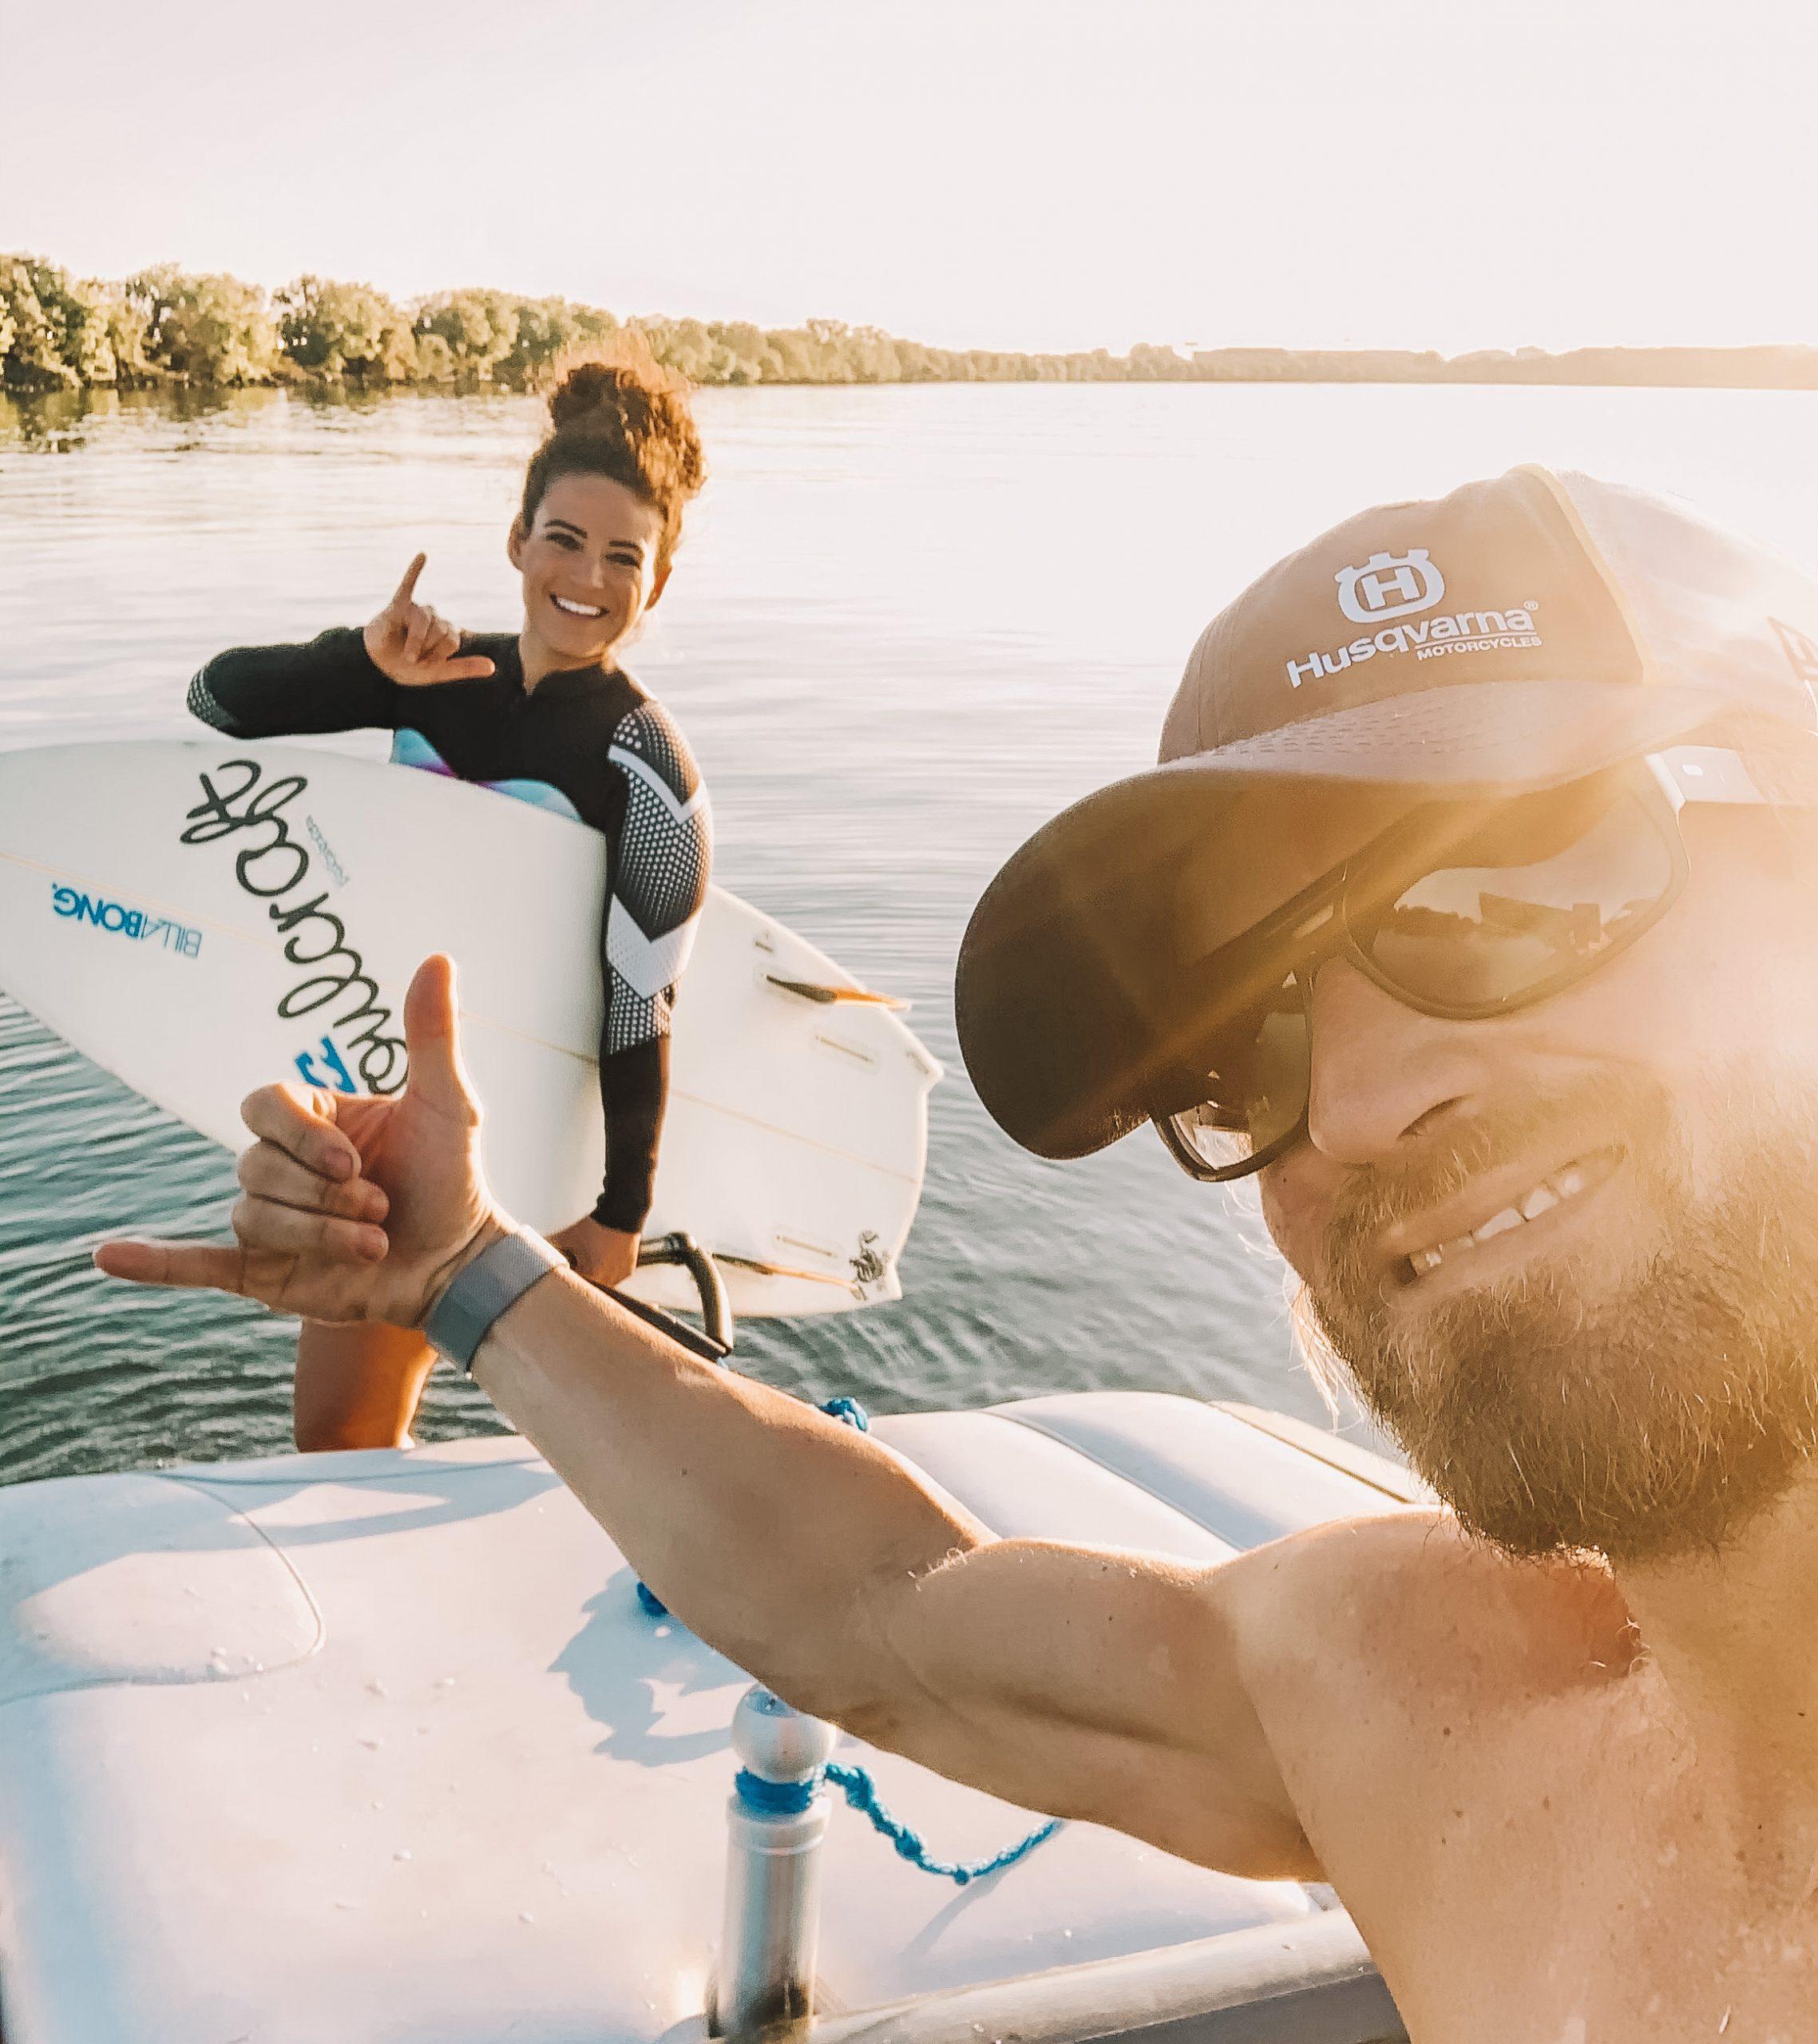 Justin and Khymii Niezgoda